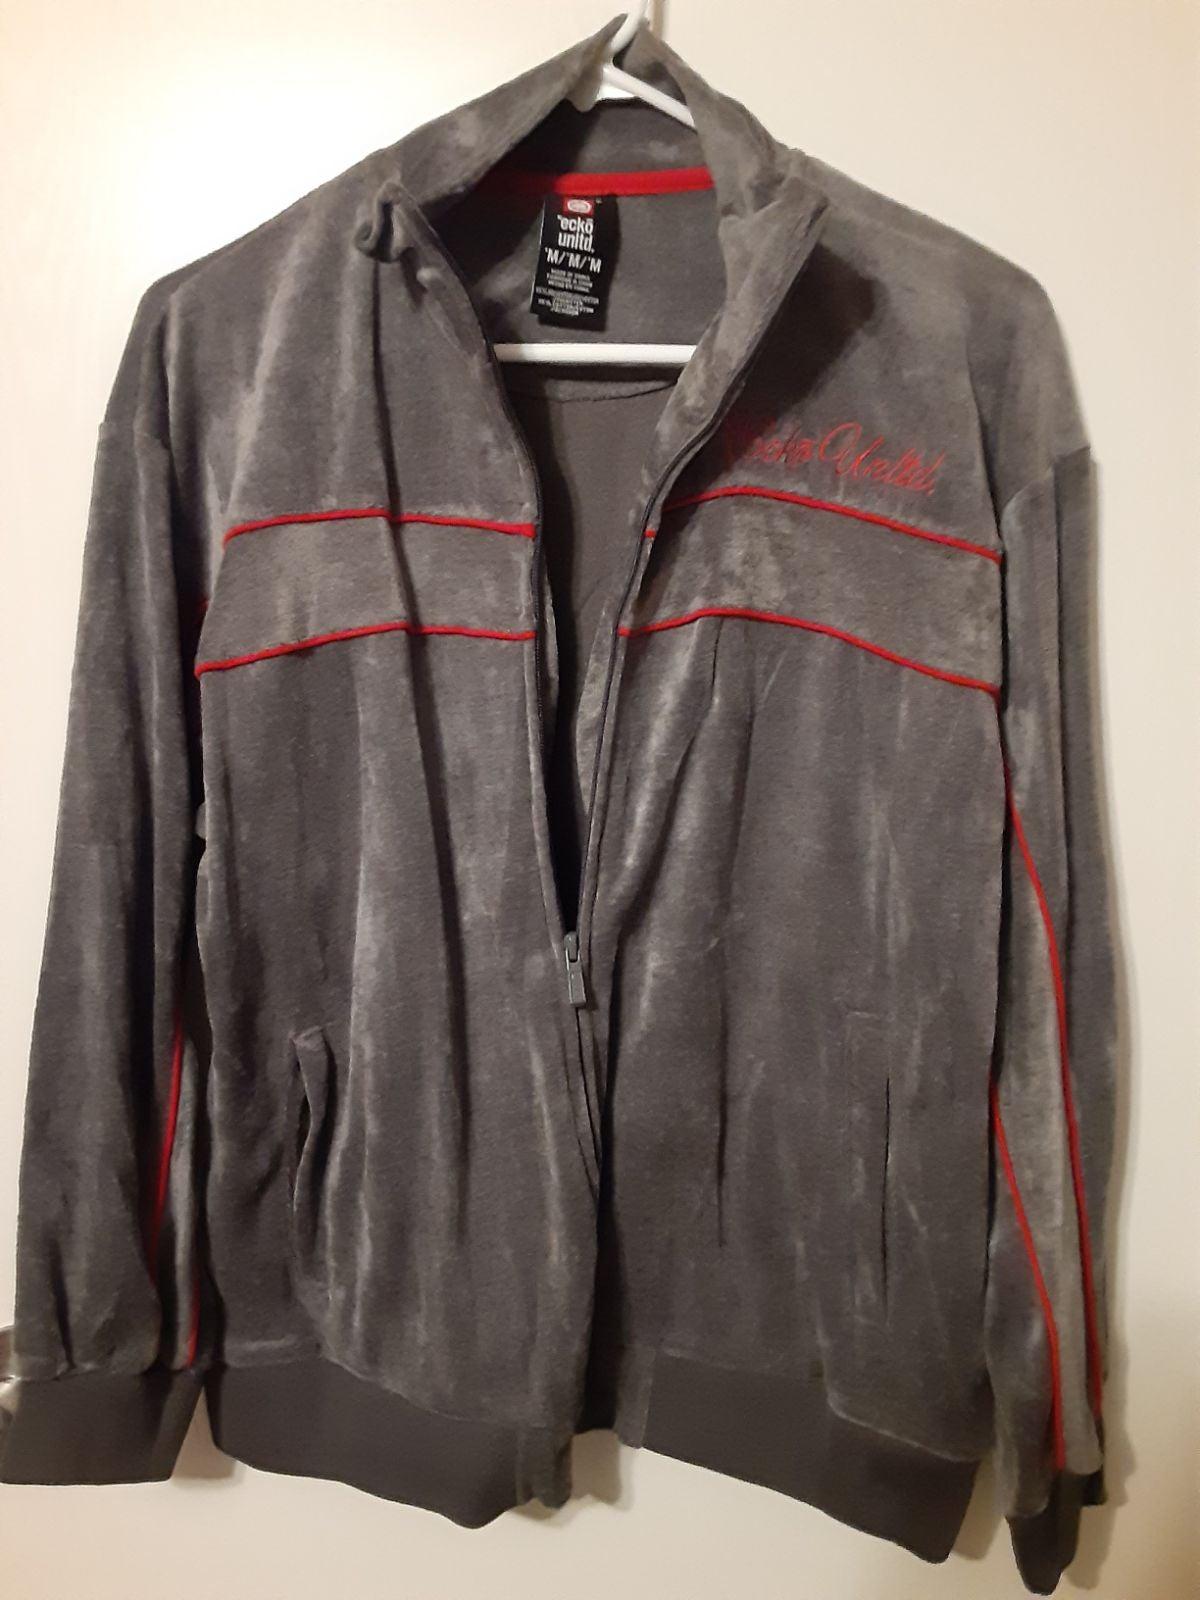 Ecko Unlimited track jacket.